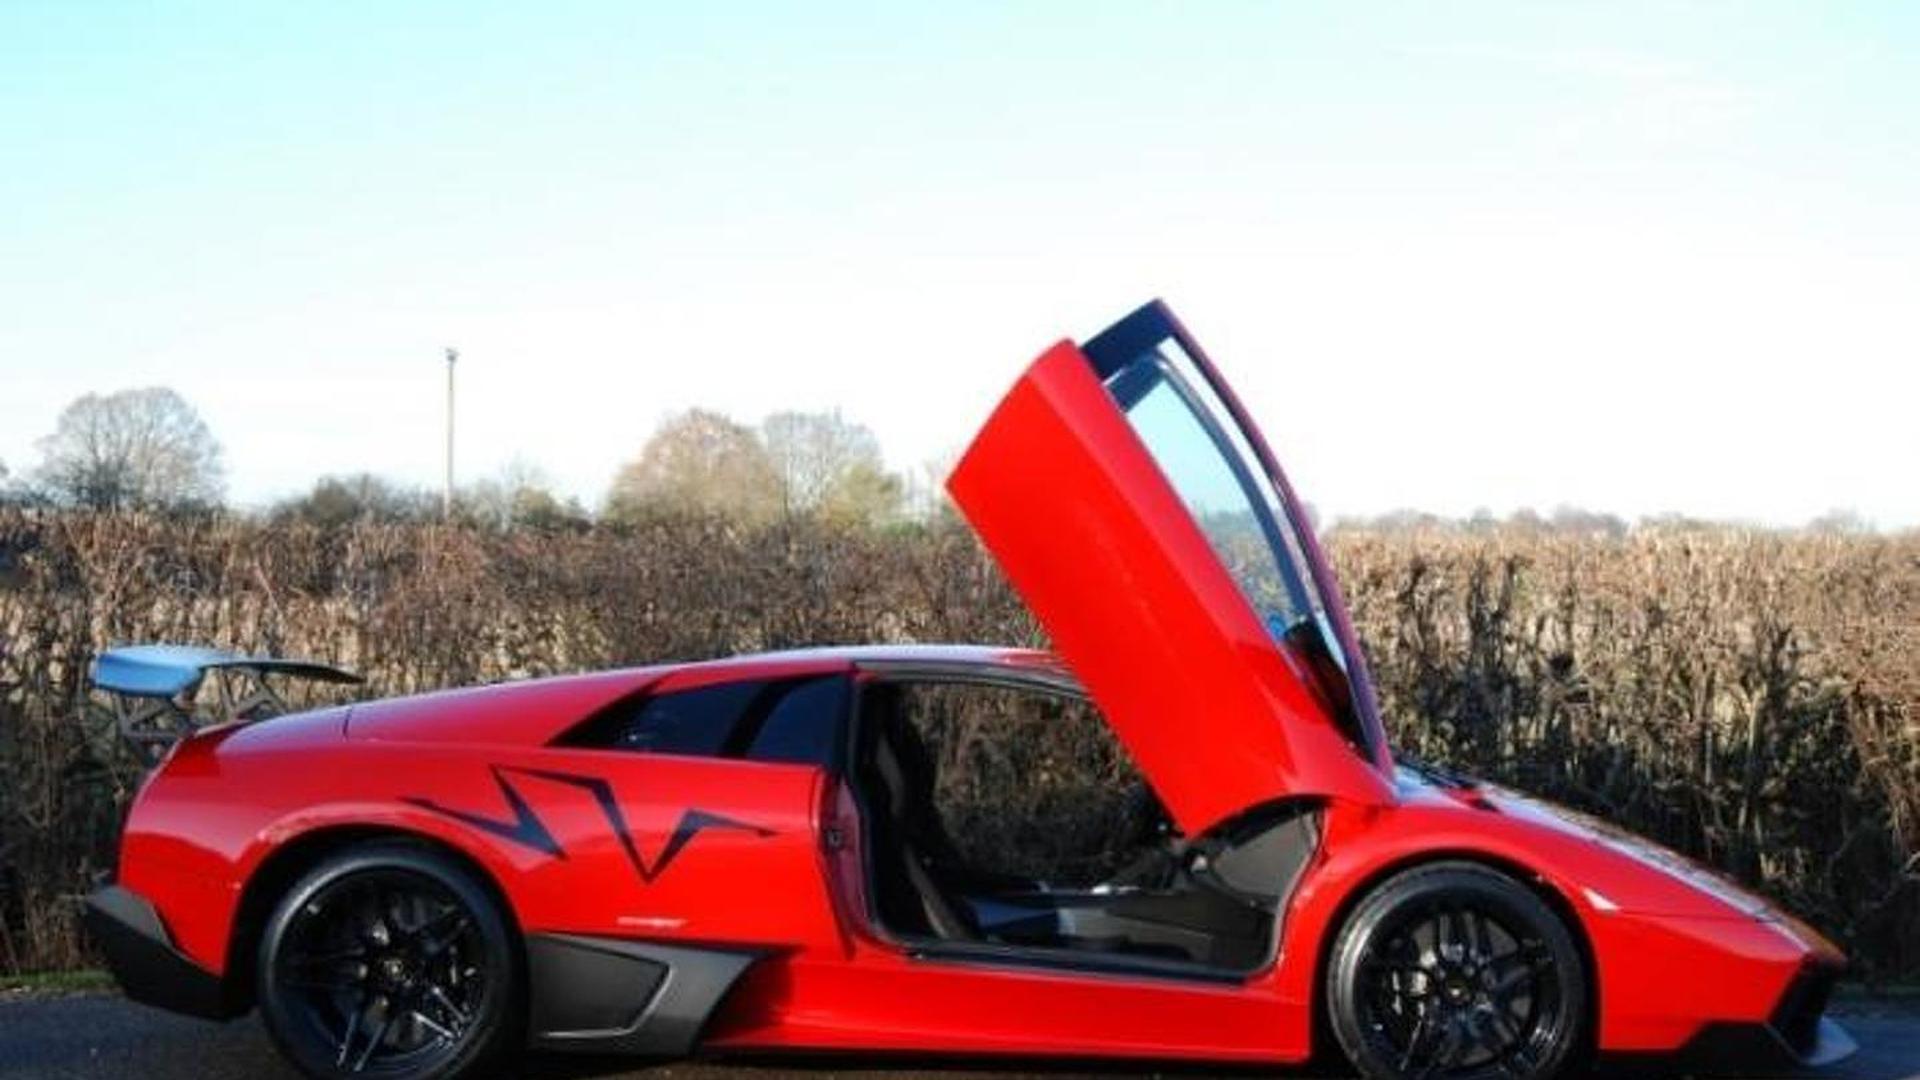 Low Mileage Lamborghini Murcielago Sv Rosso Mars Up For Grabs In Uk